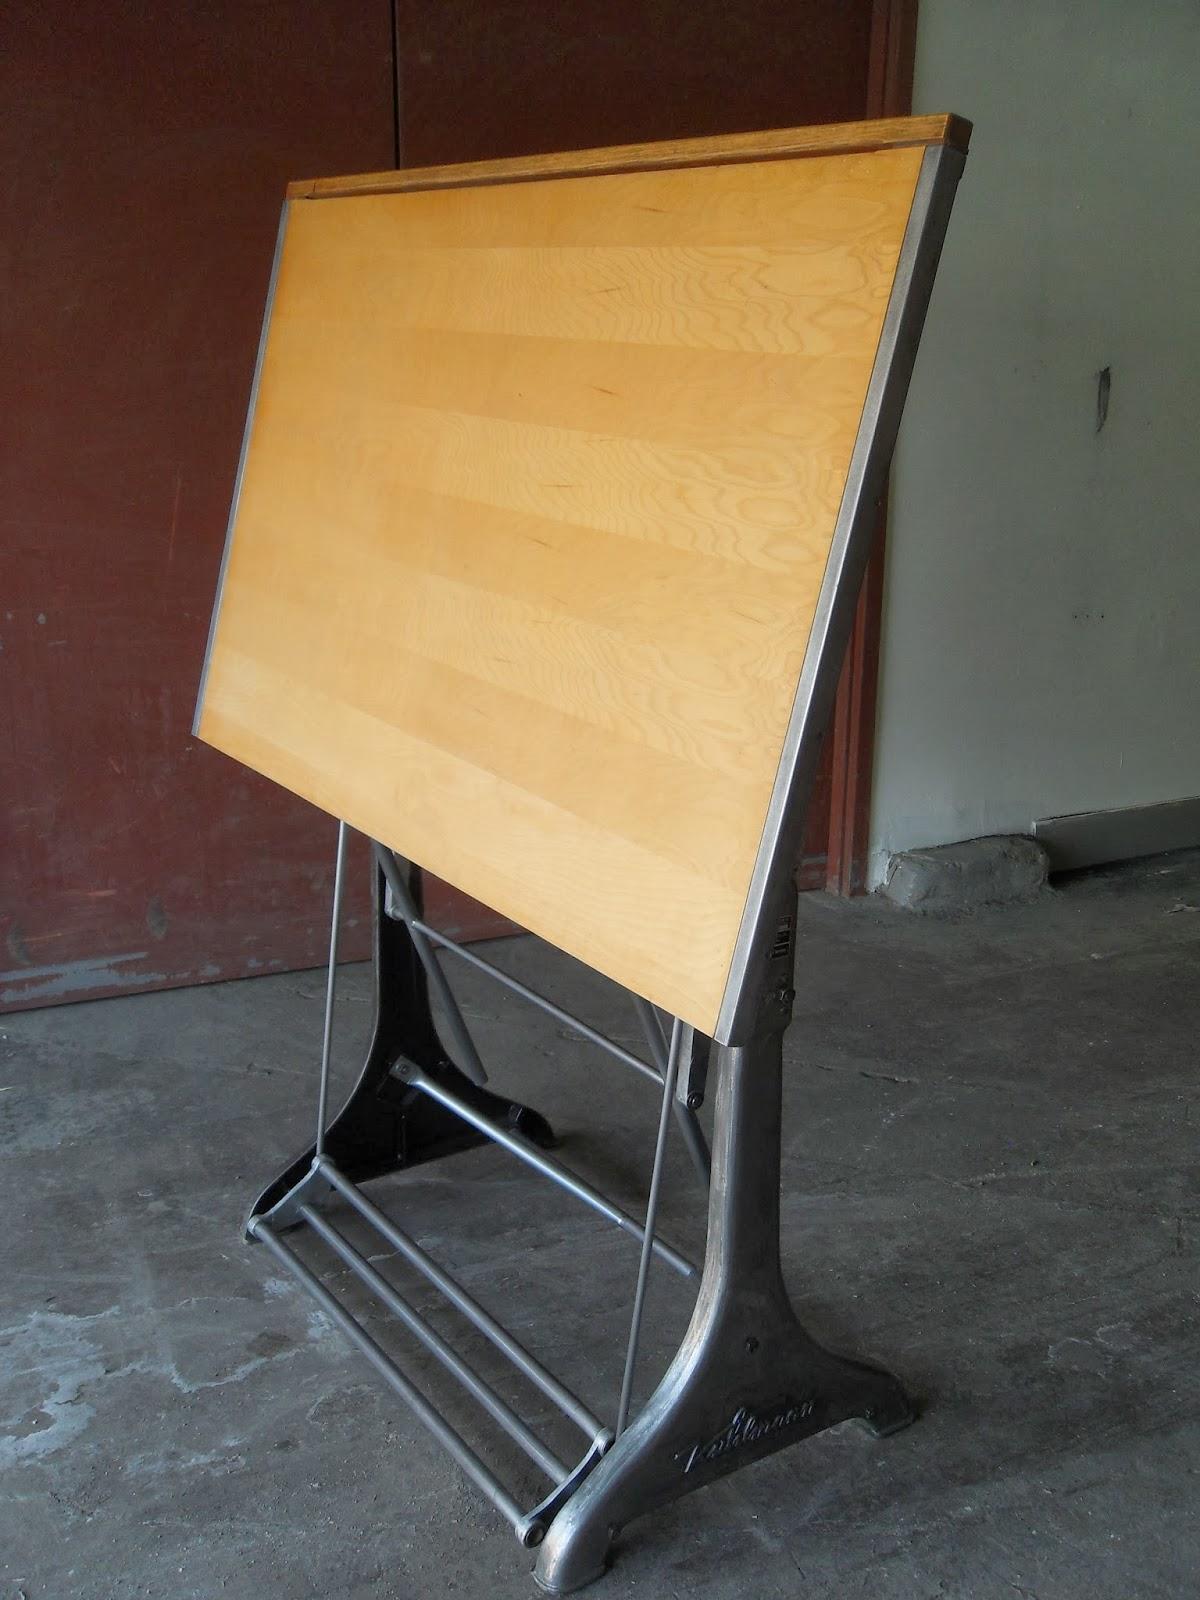 Drafting Table Toronto Adjustable Drafting Table Bloor  : SDC10429 from artofarchitect.com size 1200 x 1600 jpeg 231kB